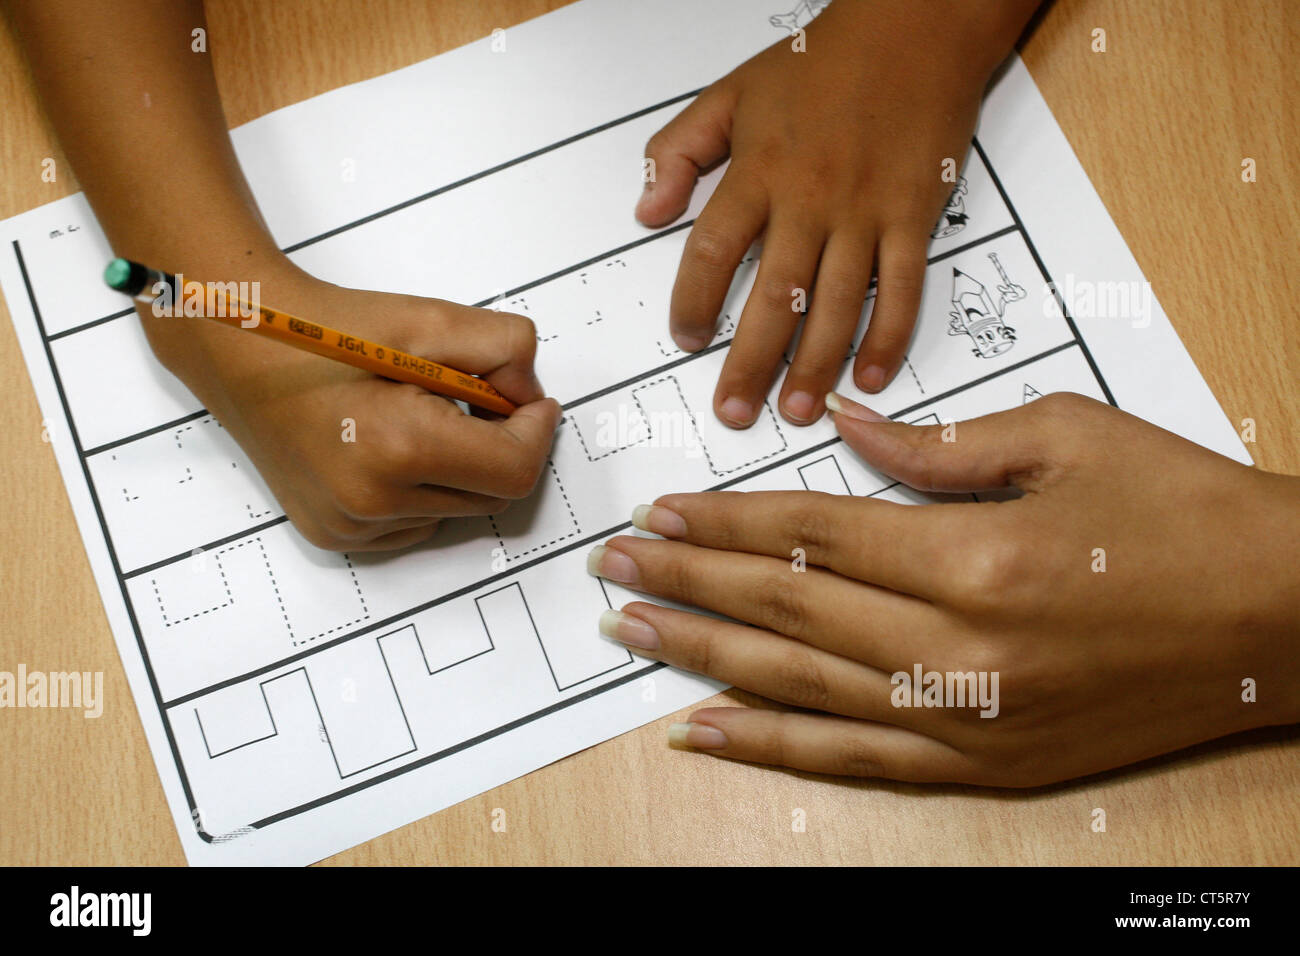 PSYCHOMOTILITY FUNCTION TEST - Stock Image